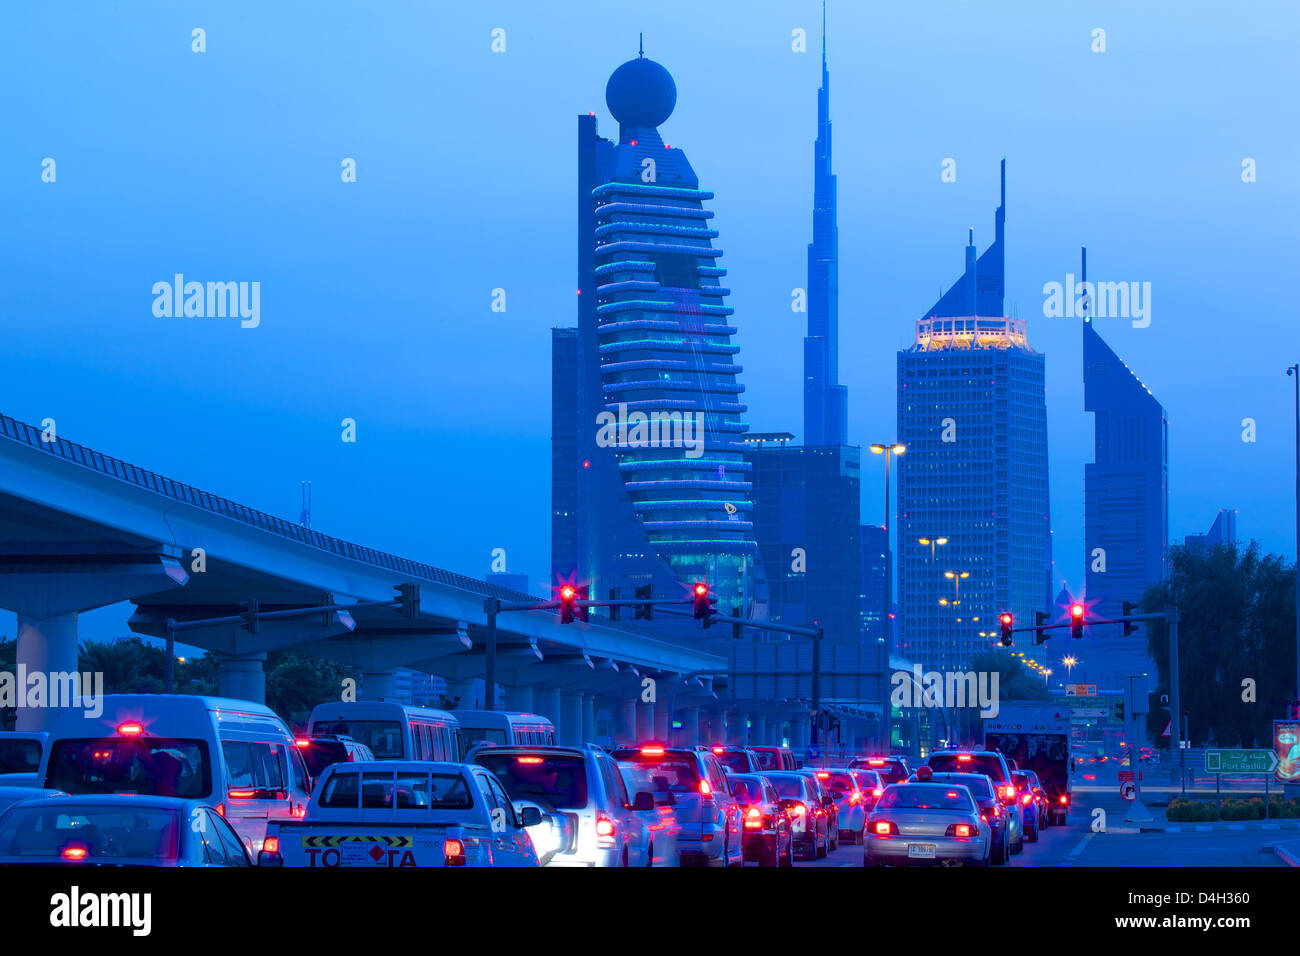 City skyline and car tail lights, Dubai, United Arab Emirates, Middle East - Stock Image